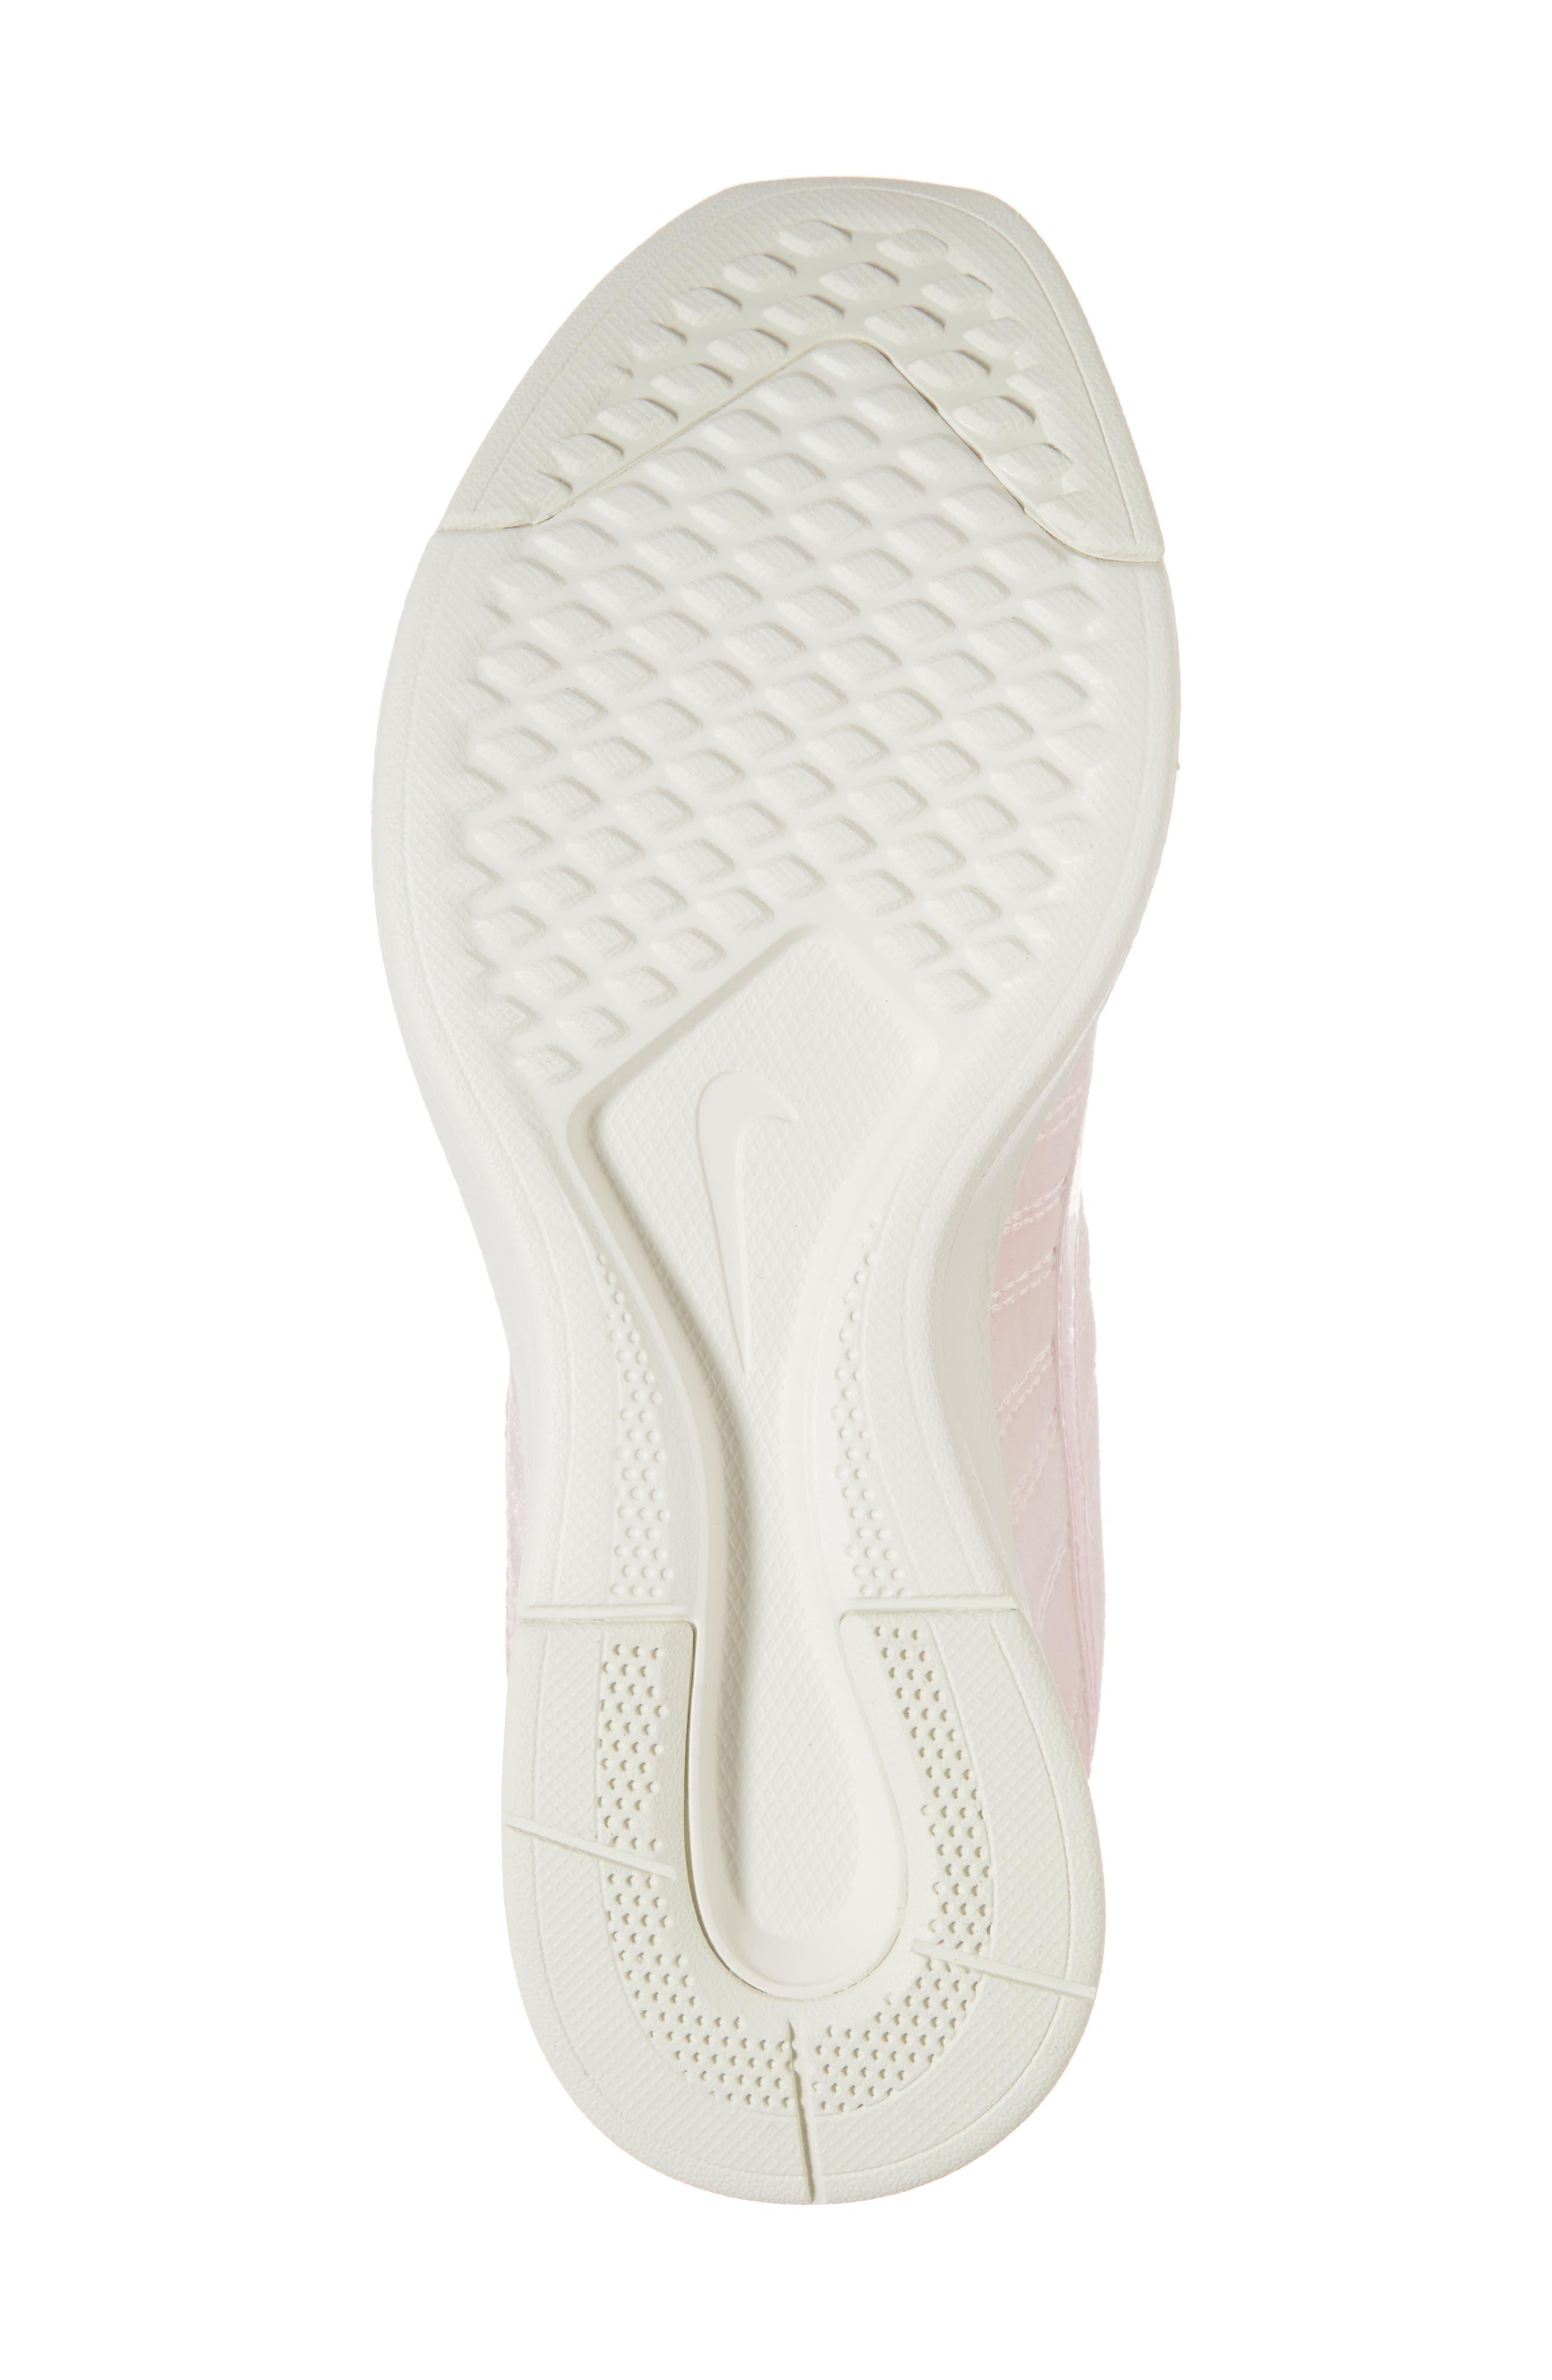 Dualtone Racer SE Sneaker,                             Alternate thumbnail 6, color,                             Arctic Pink/ Arctic Pink/ Sail